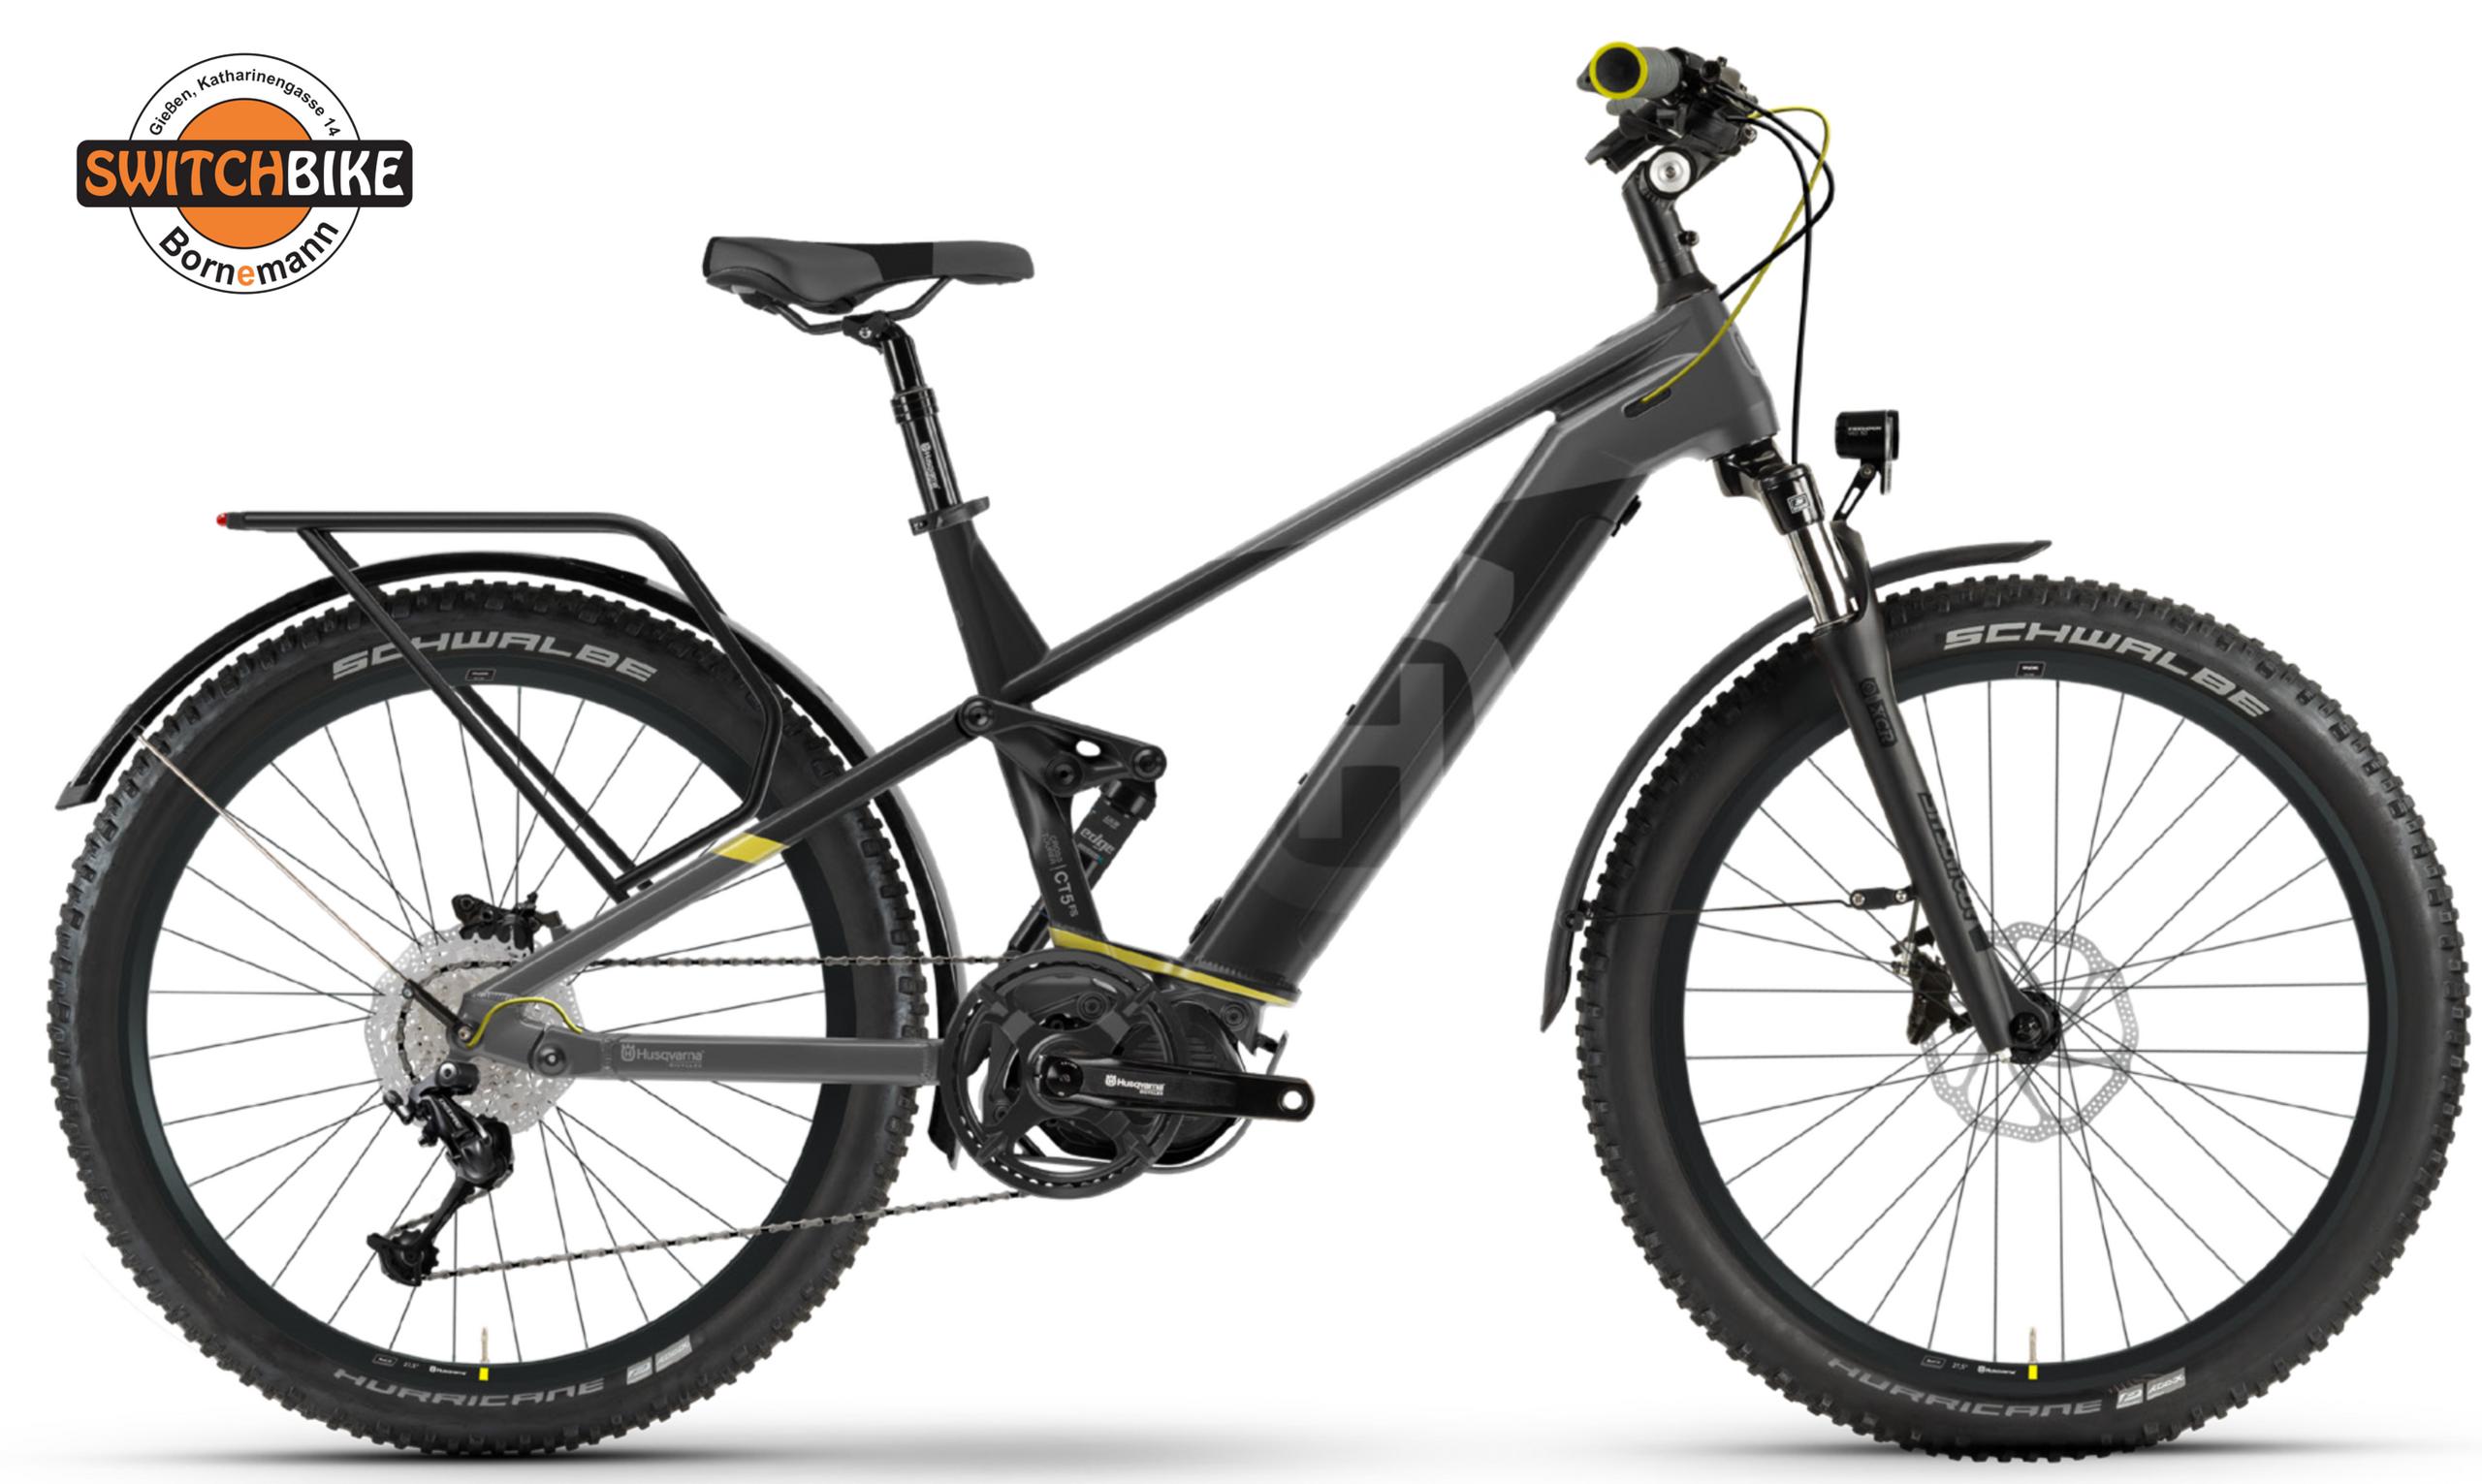 Husqvarna e-bike Neuheiten 2020 Switchbike Bornemann Gießen